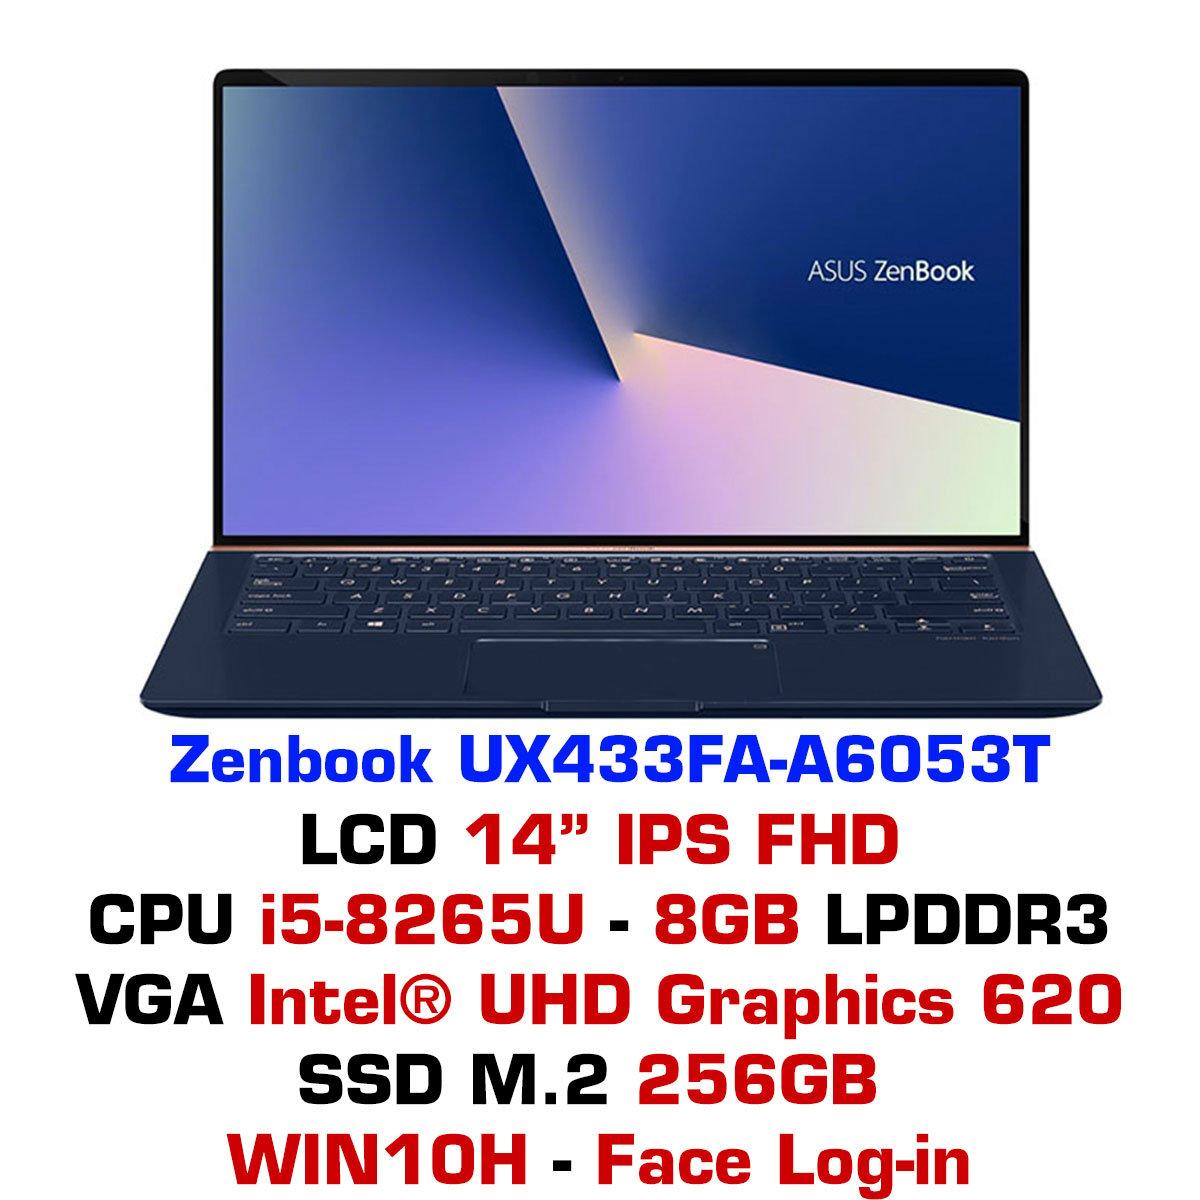 Laptop Asus ZenBook UX433FA-A6053T